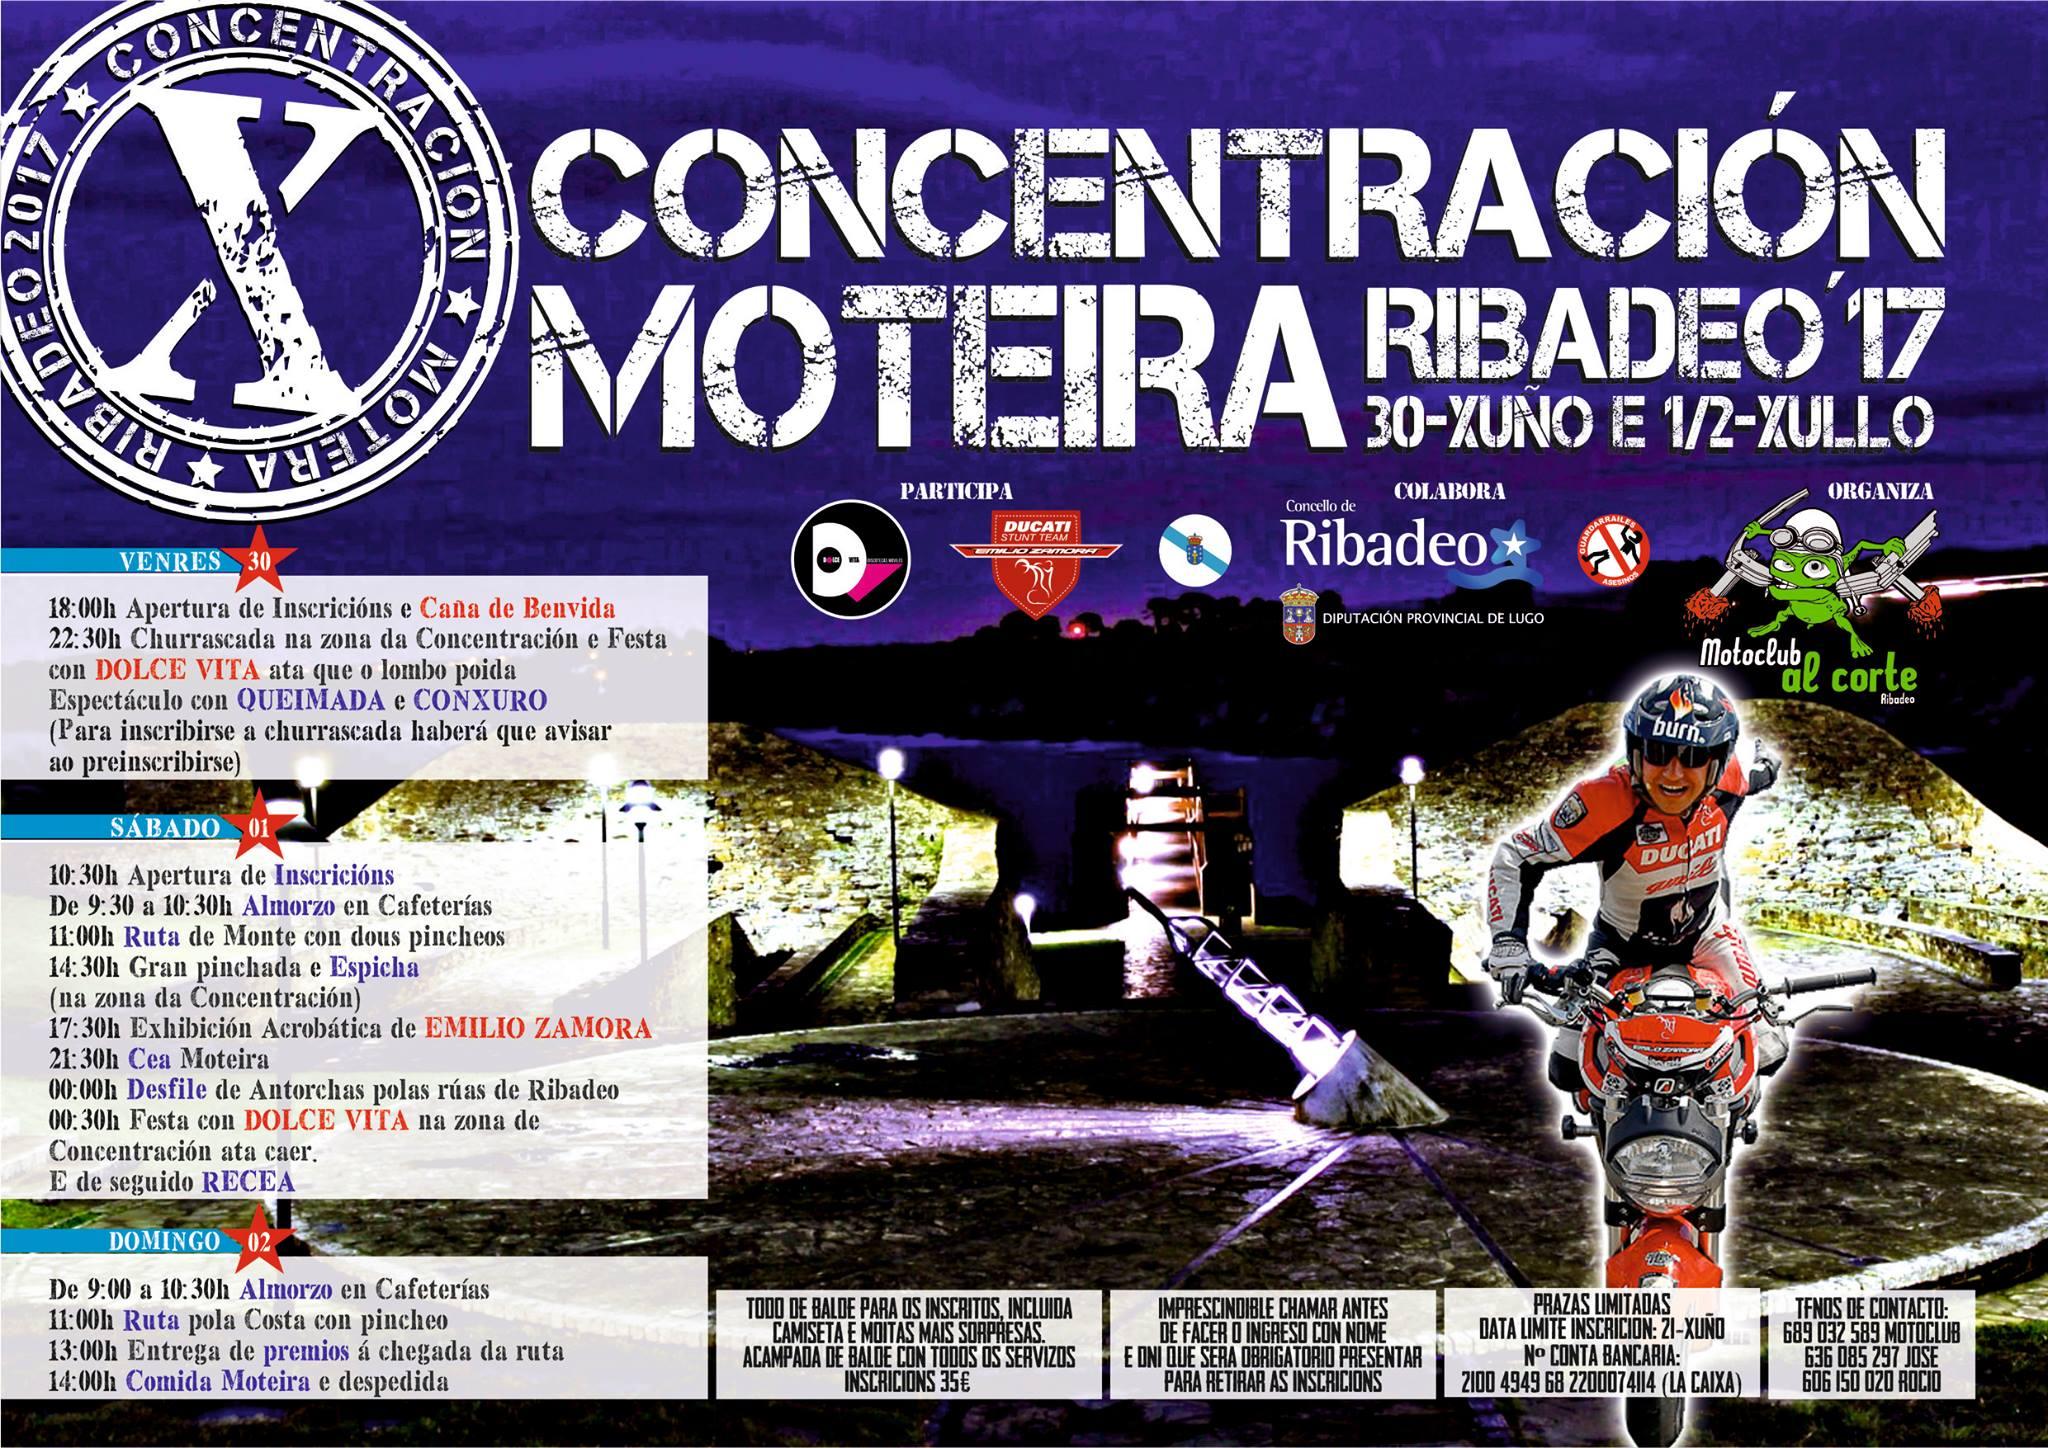 CONCENTRACION_MOTORISTA_RIBADEO_2017_LUGO_FIESTA_MOTERA_EMILIO_ZAMORA_DUCATI_STUNT_TEAM_MOTOR_SHOW_ESPECTACULO_MOTO_QUAD_COCHE_KART_CROSS_CUSTOM_LEGEND_CAR_MINI_BIKE